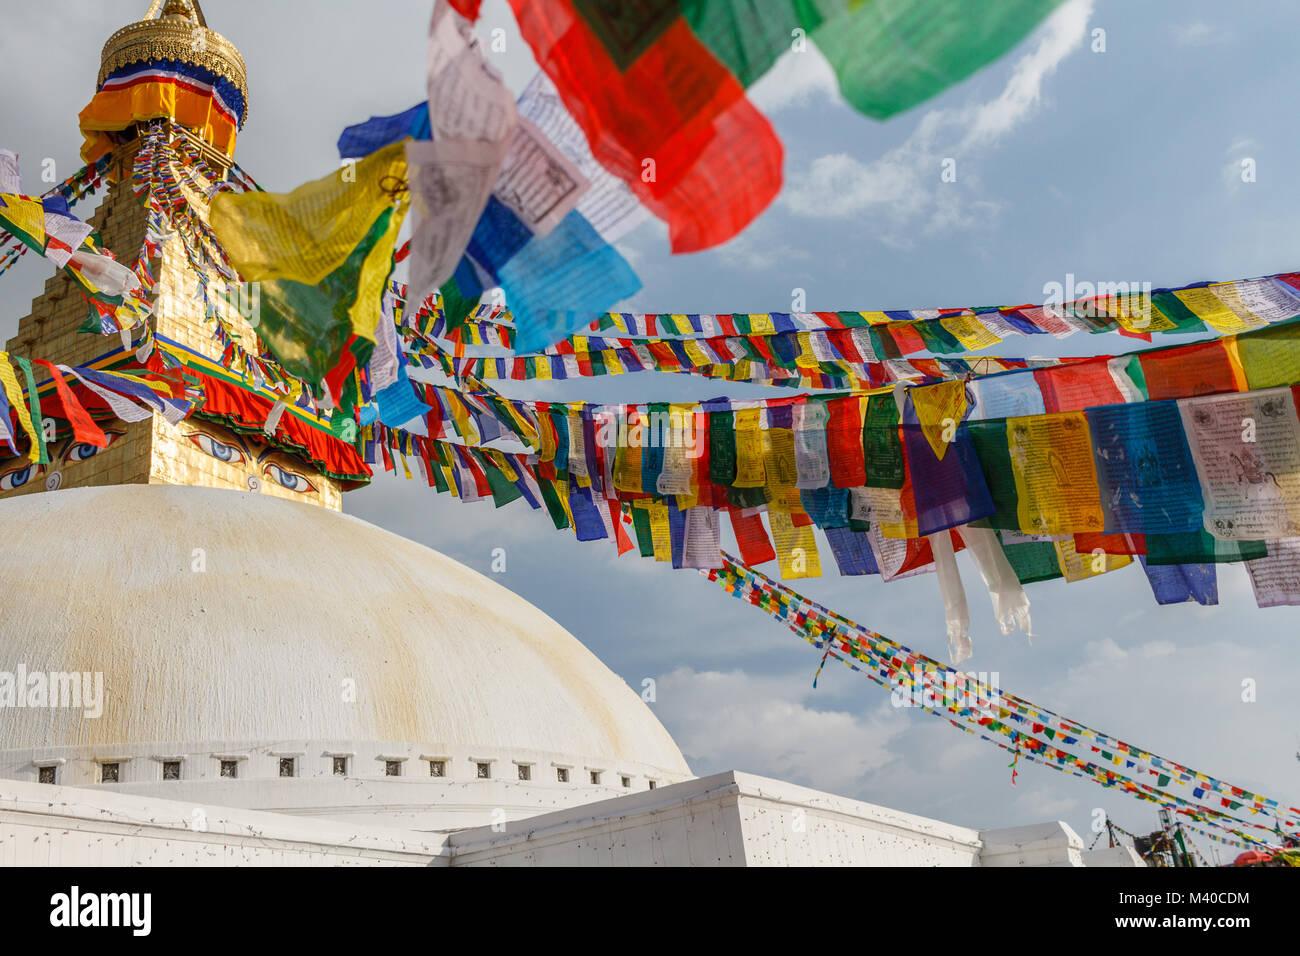 Boudhanath stupa with prayer flags, Kathmandu, Nepal - Stock Image